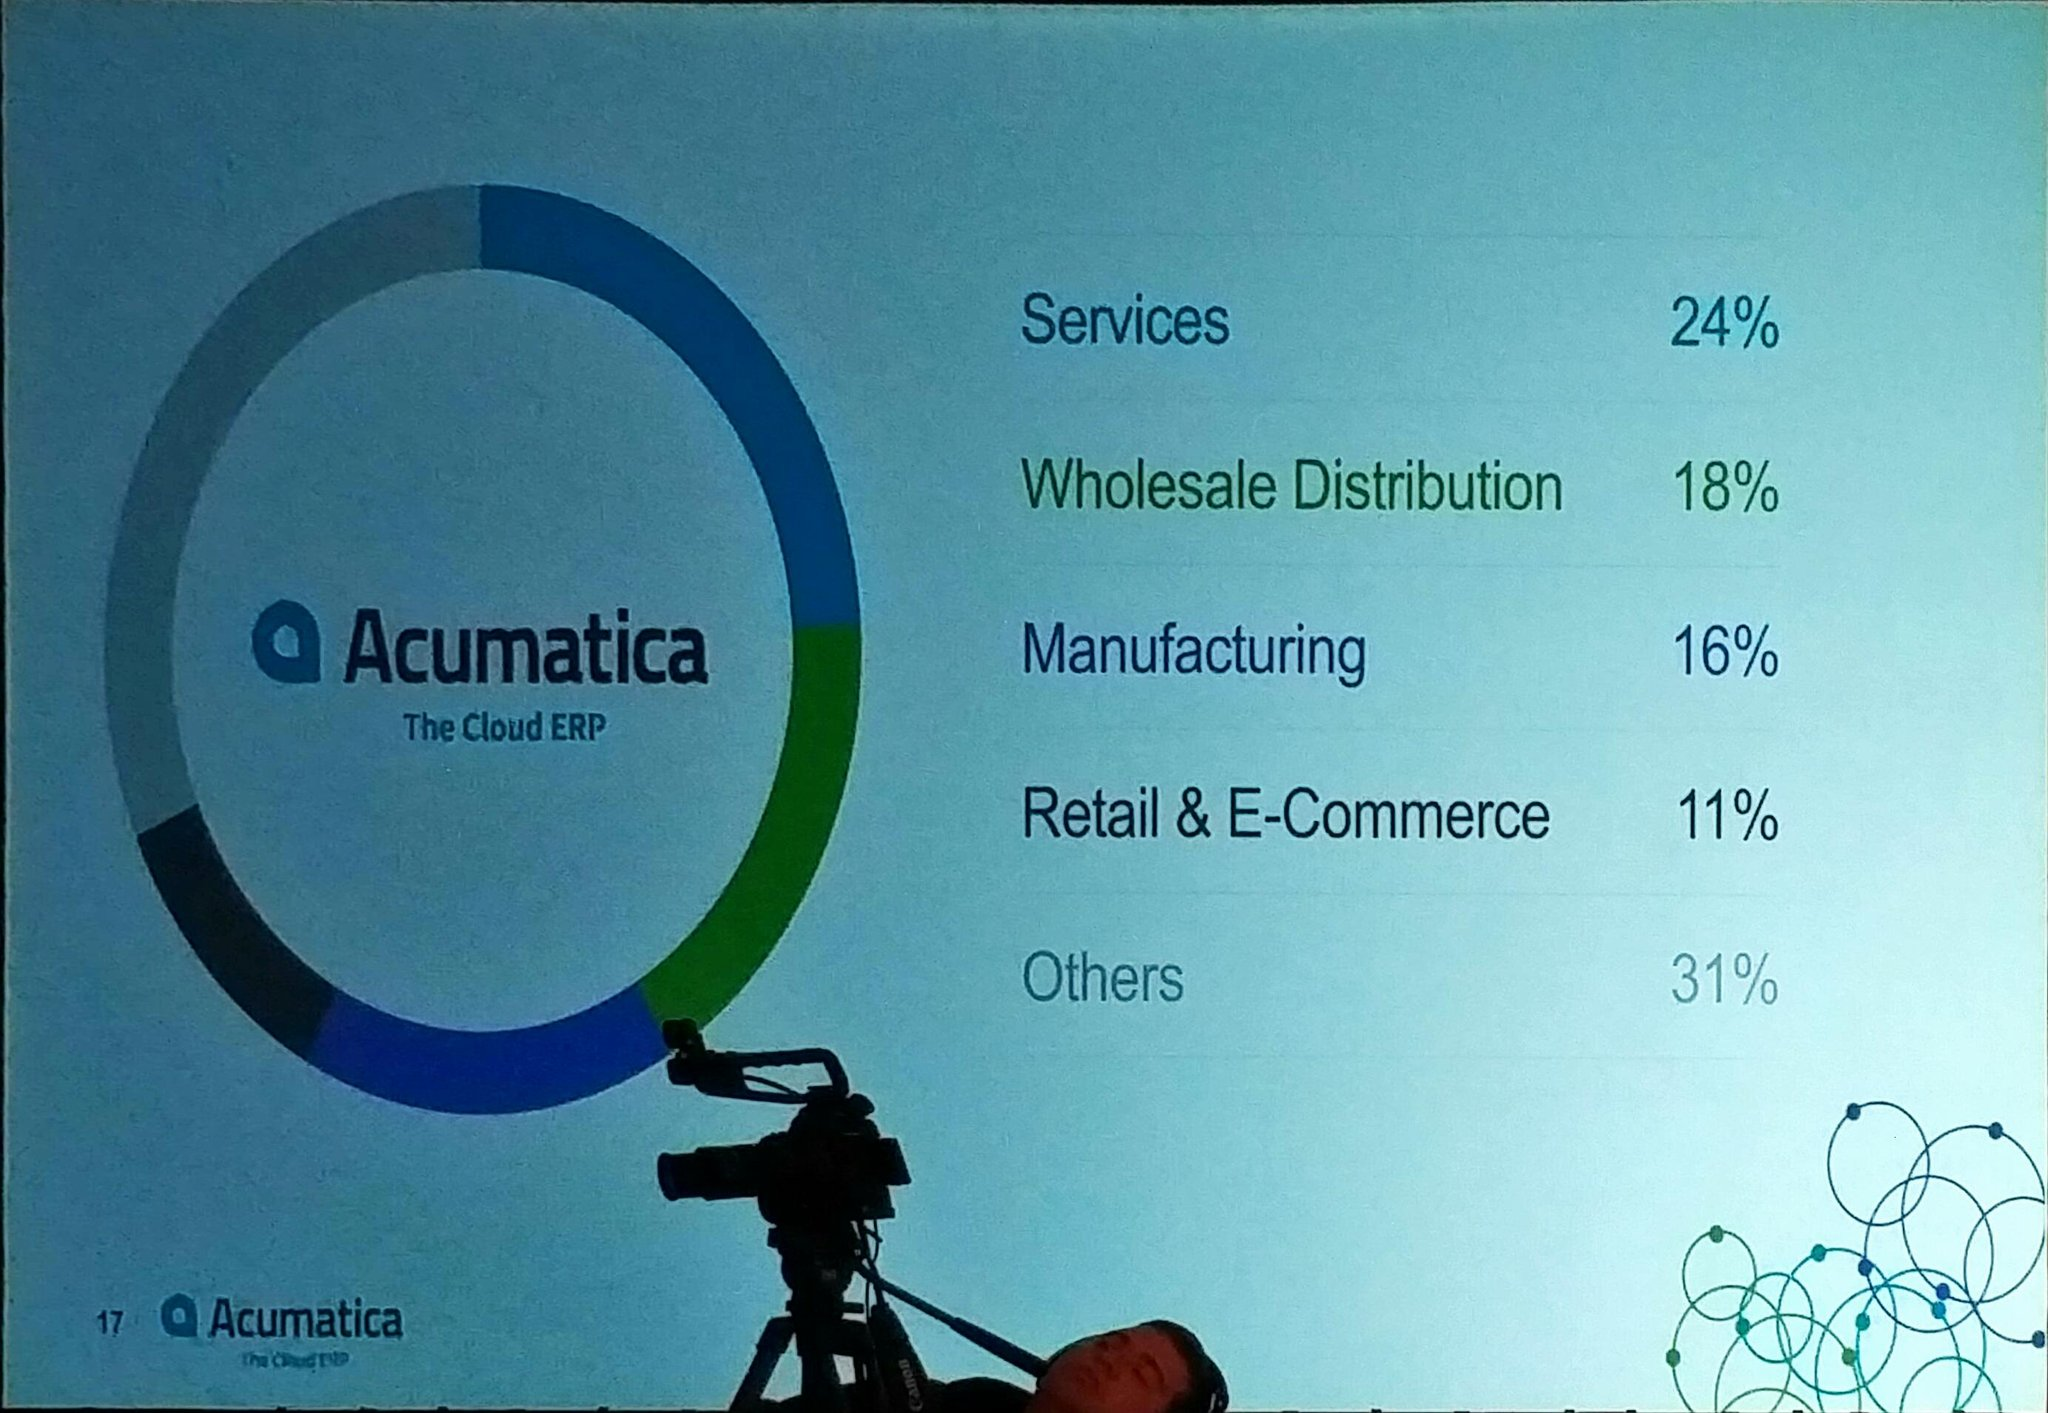 The @Acumatica customer break down  24% Services  18% Wholesale Distribution  16% Manufacturing  11% Retail &  E-Commere #AcumaticaSummit https://t.co/fVxWqsijru